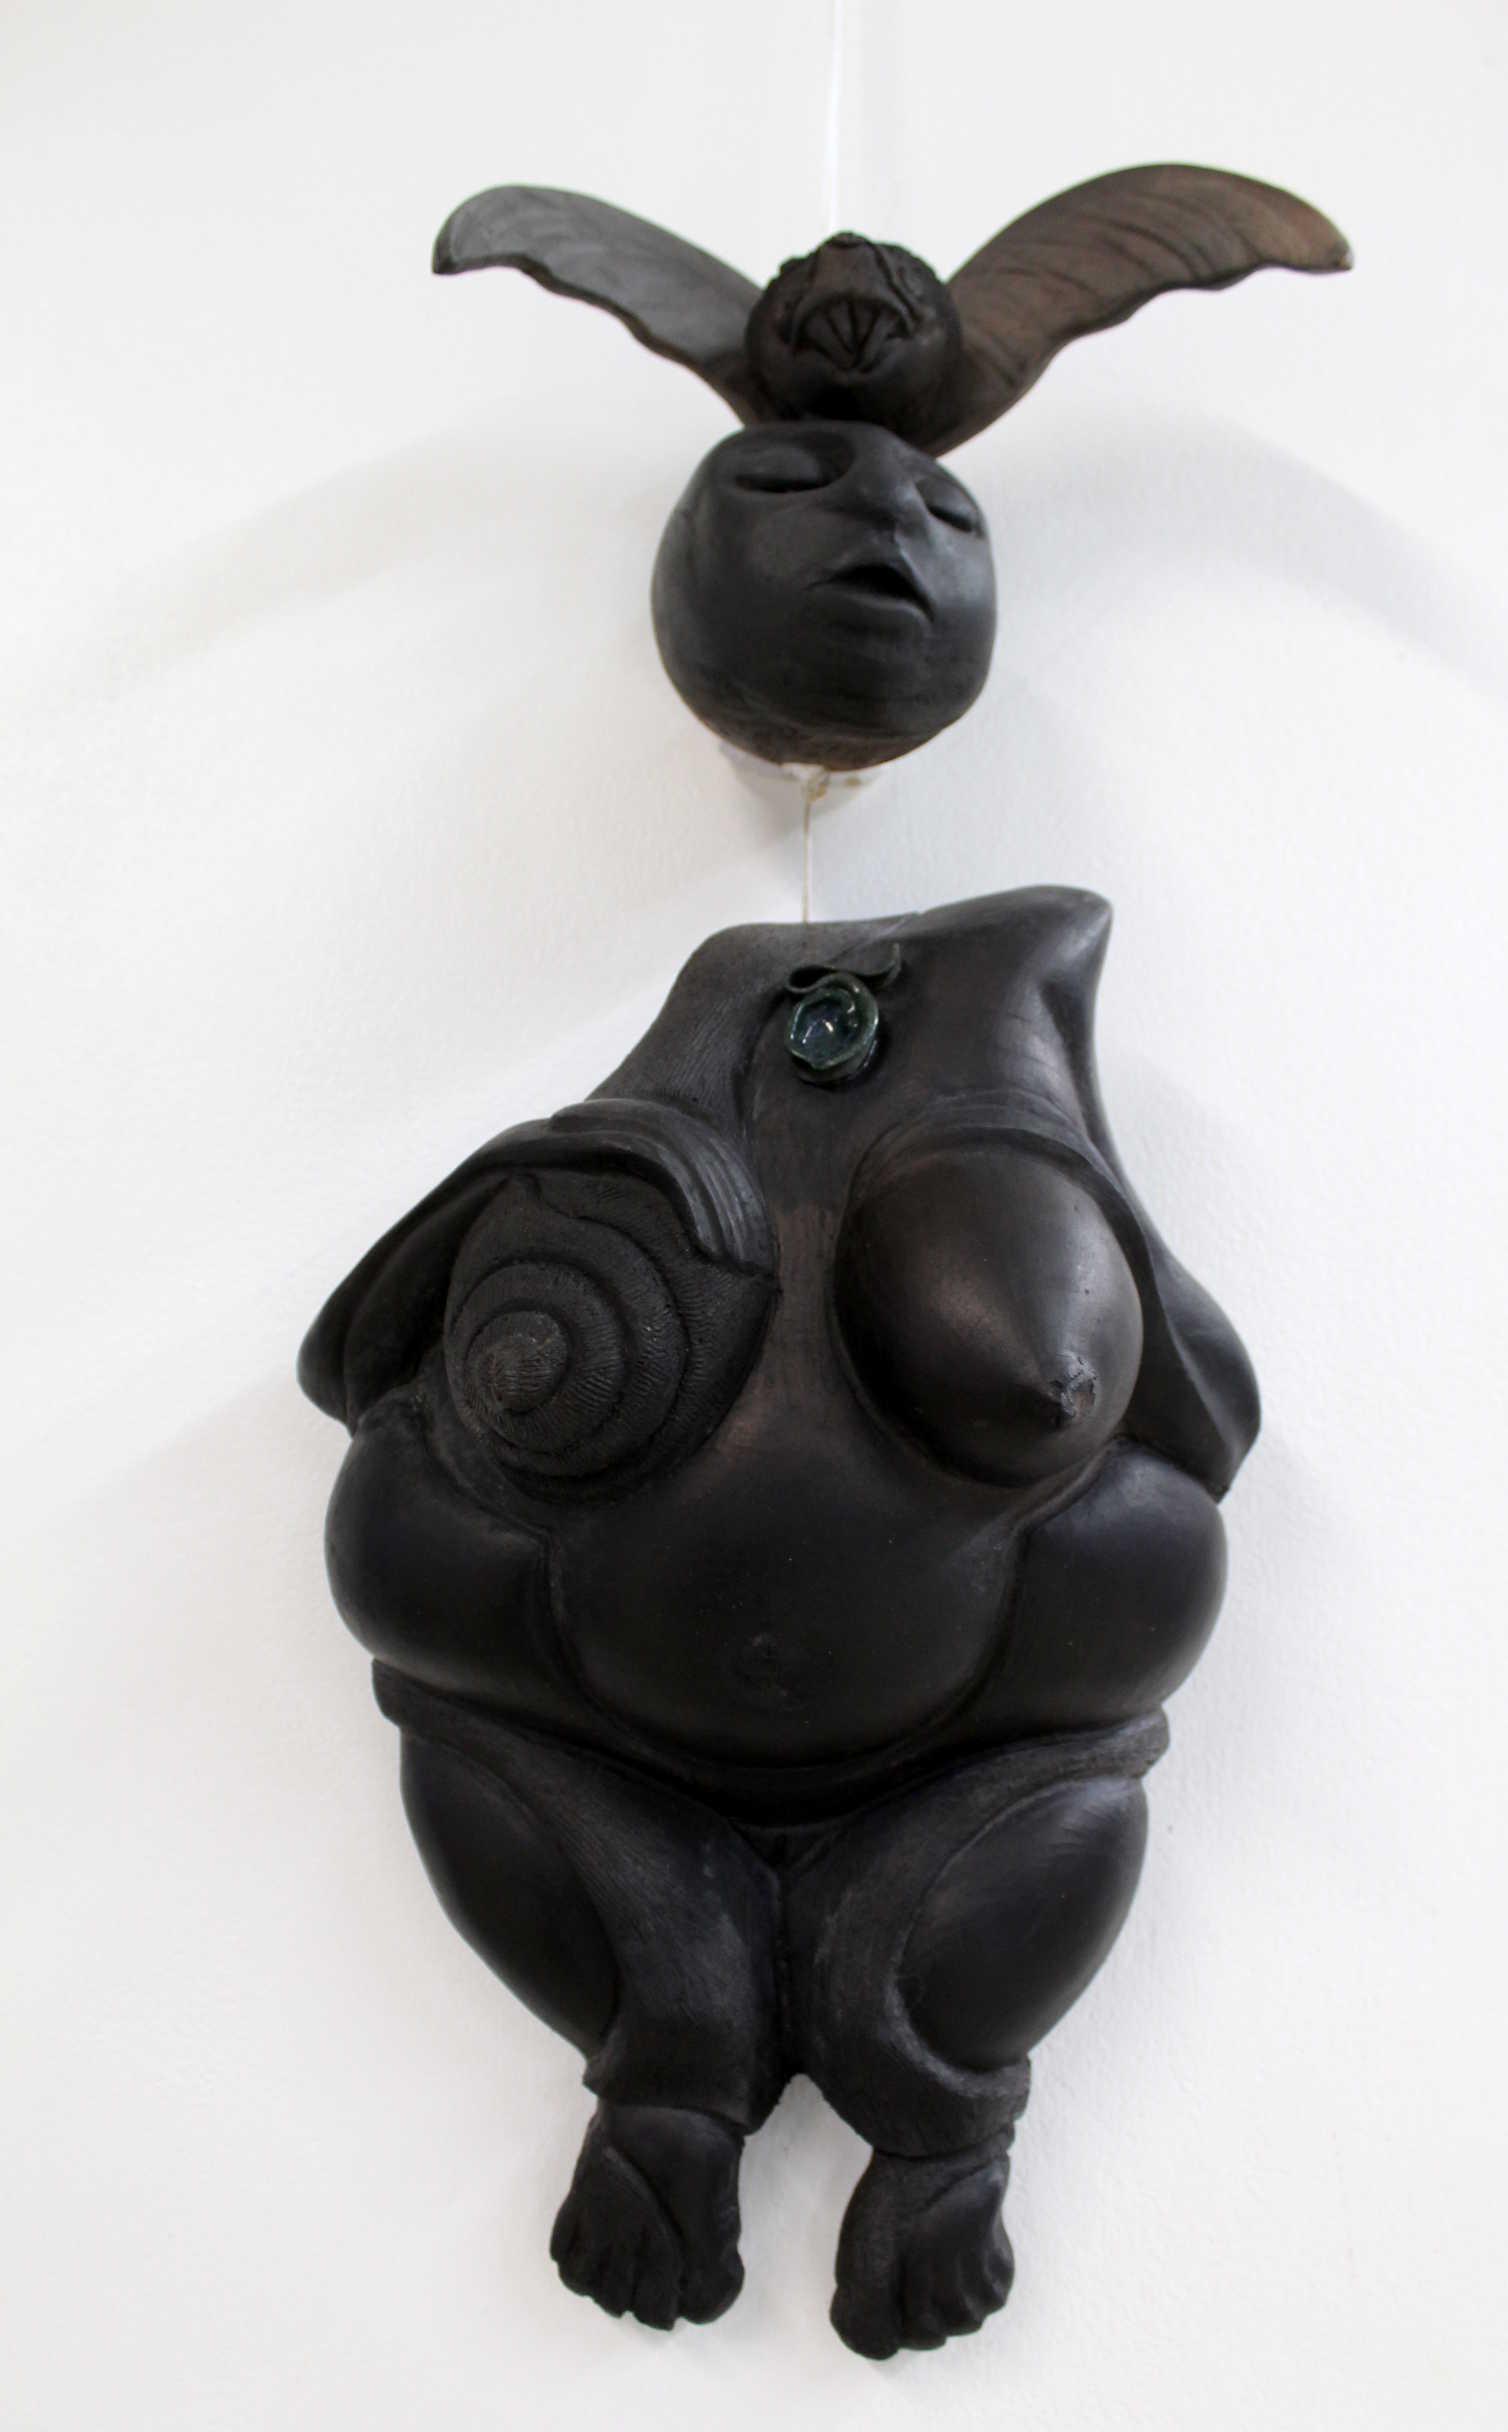 "Obra de Iria Salas, llamada "" Iriria II"" , Técnica: Placas. Hornos de aserrín, año 2017. Fotografía: Adriana Araya."